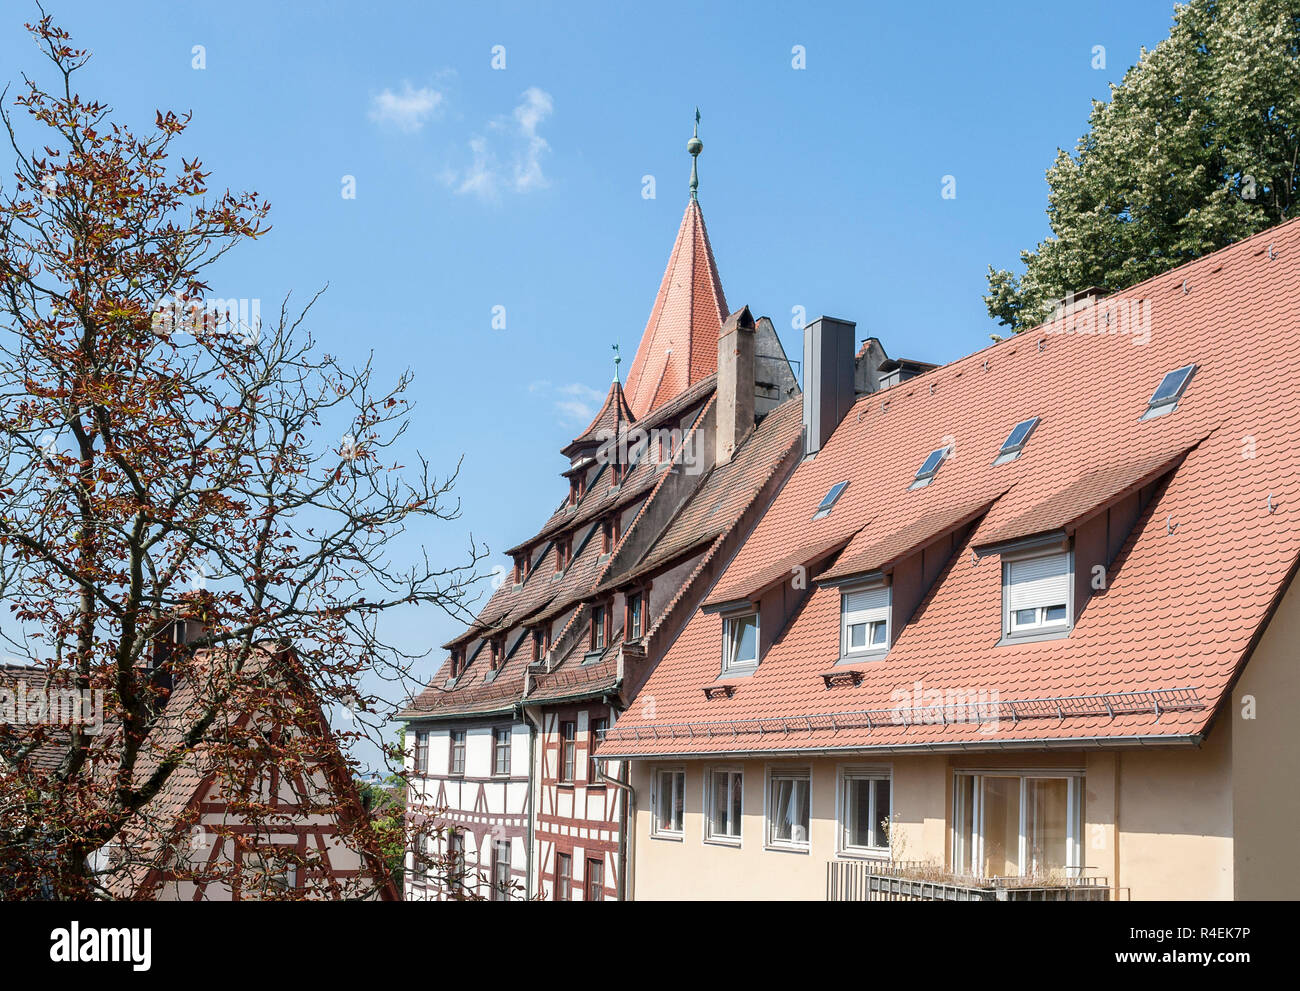 houses in nuremberg - Stock Image